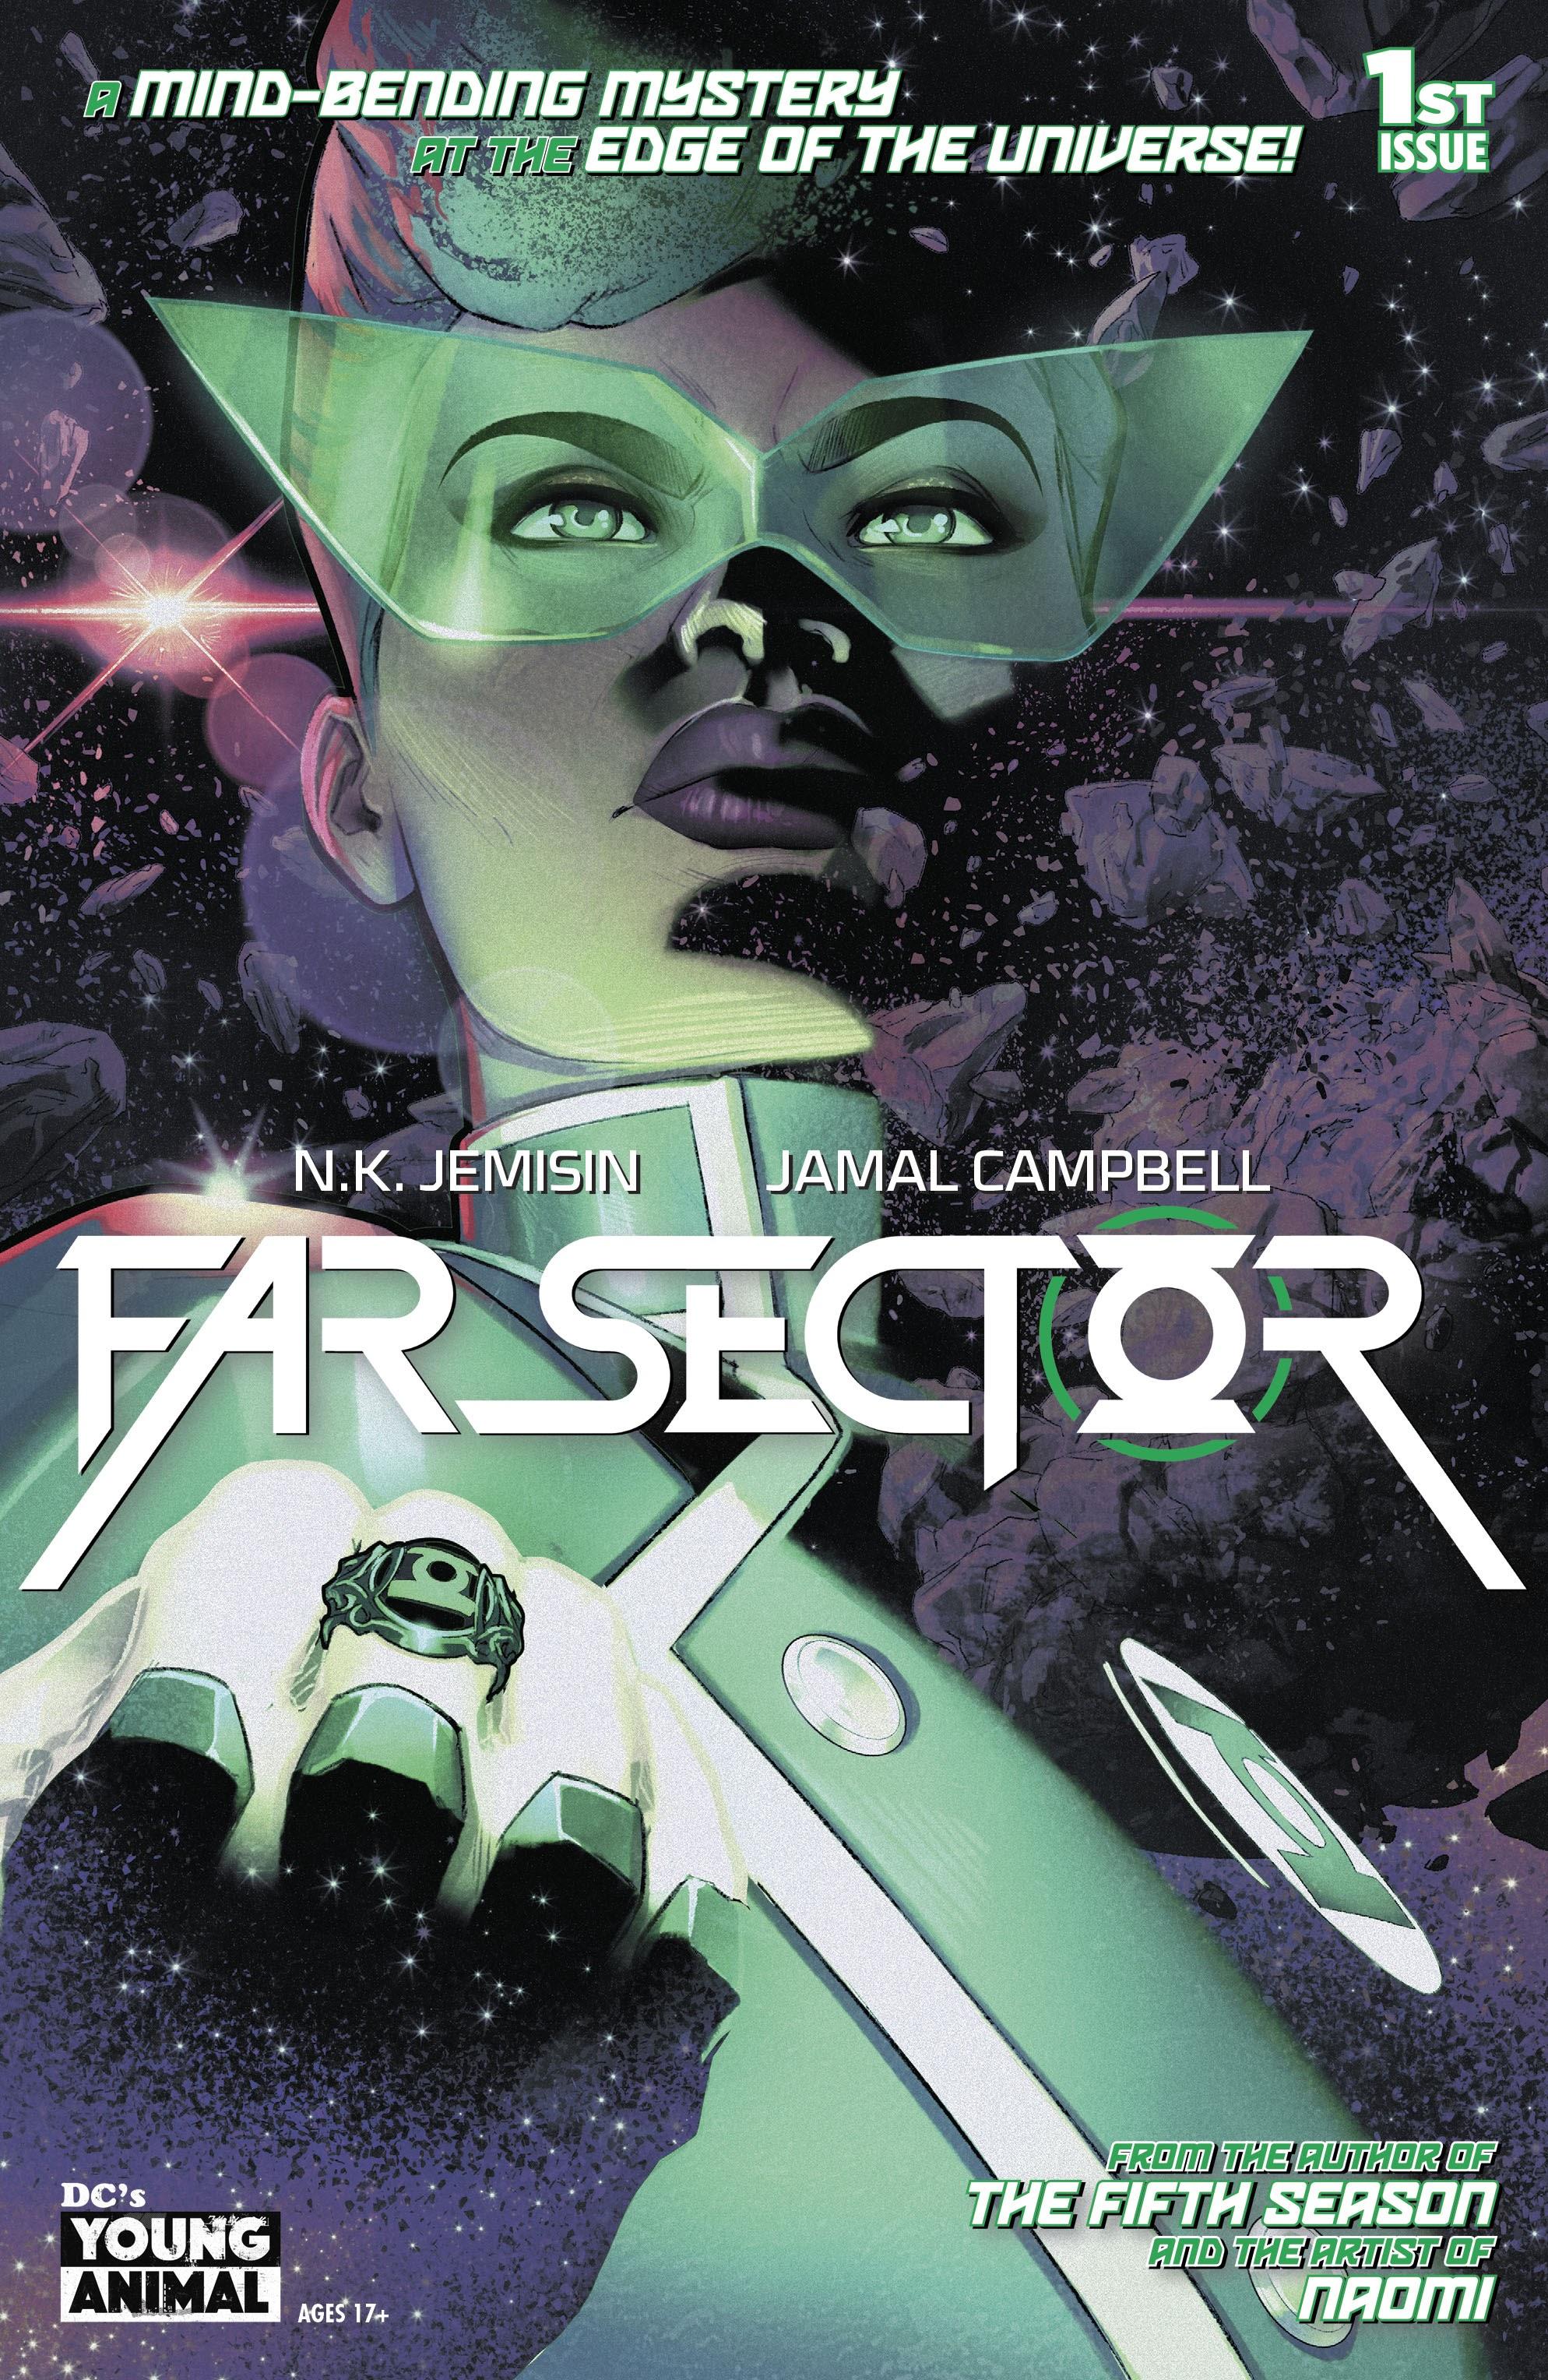 【DC宇宙相關】一個綠光戰警跑到宇宙最遠處值勤的孤單故事《Far Sector》推薦!